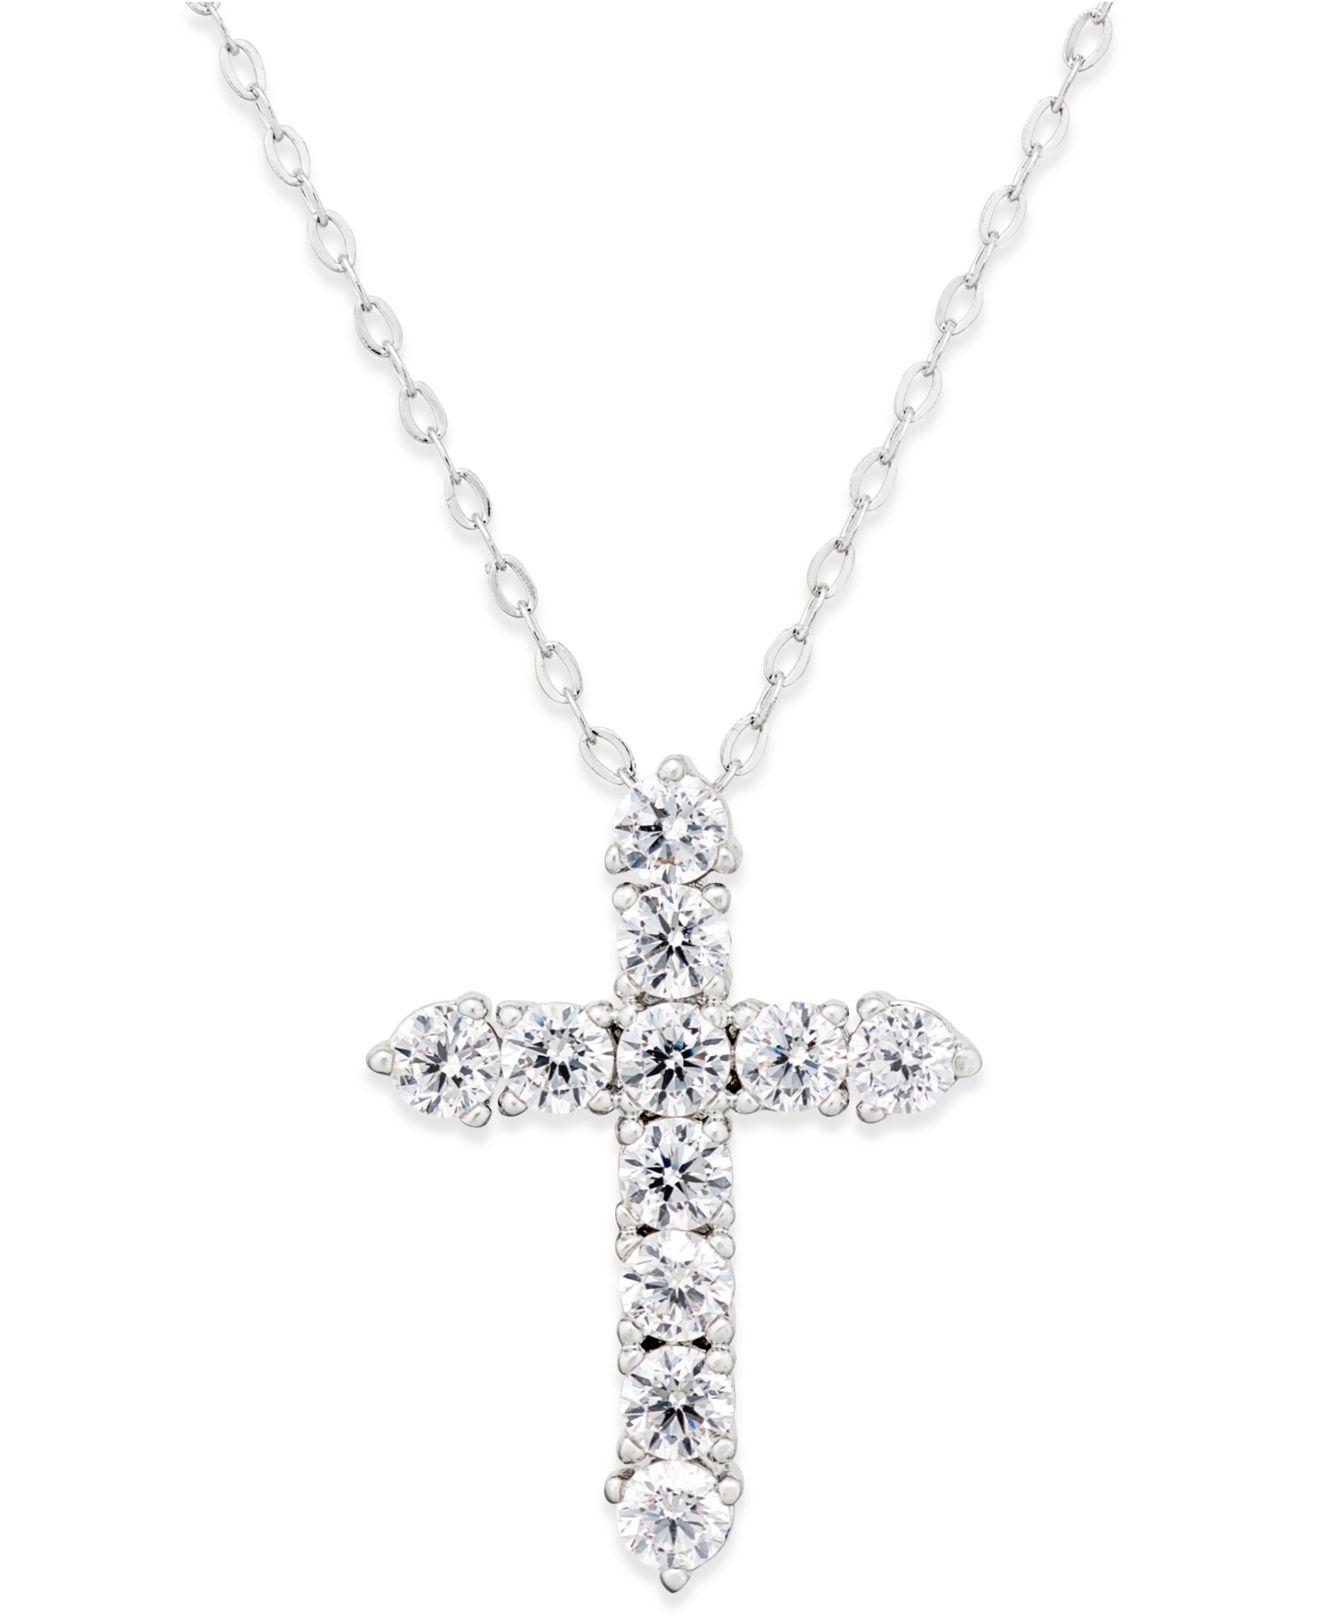 Danori Eliot Silver Tone Crystal Cross Pendant Necklace In